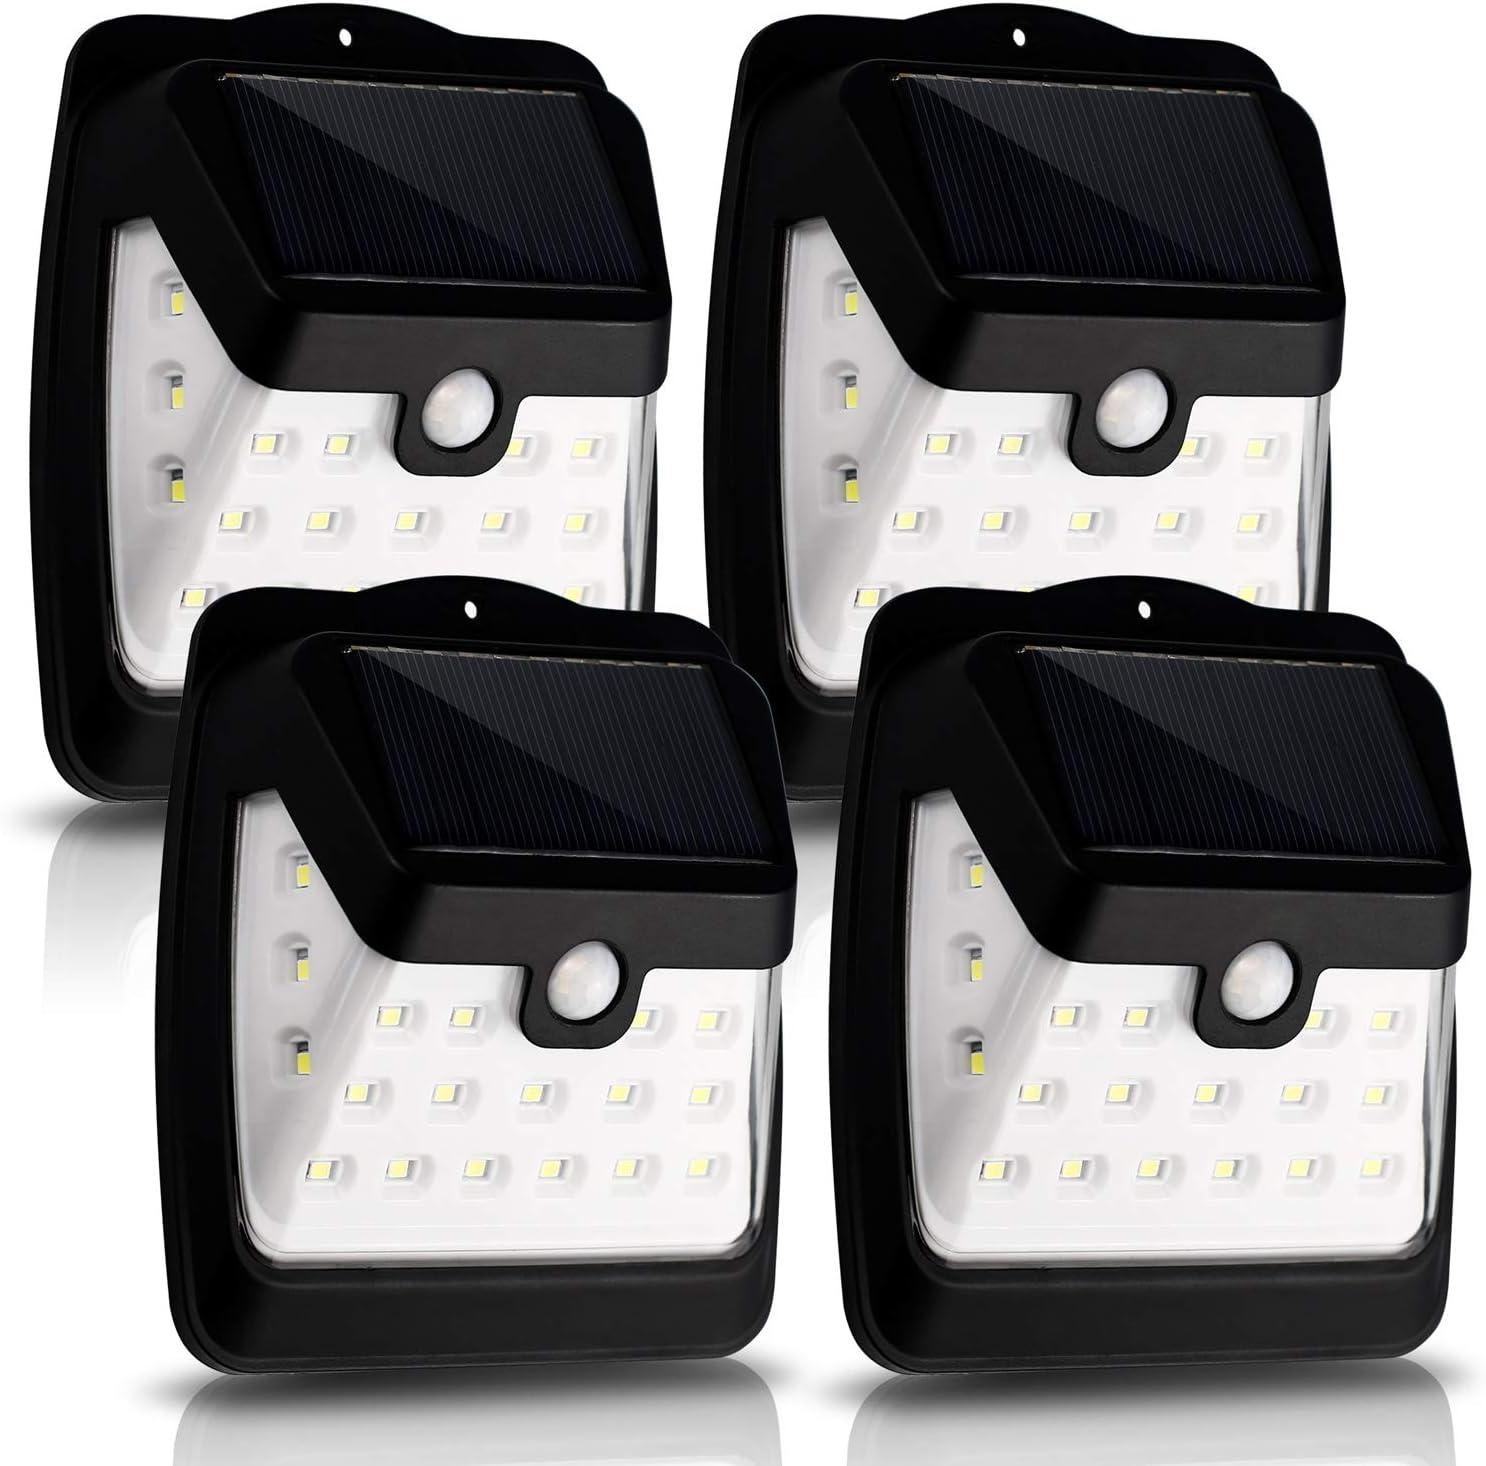 CANAGER Solar Lights Outdoor,Wireless Motion Sensor Lights, 21 LED Waterproof Wall Lights for Front Door,Garage,Patio,Yard,Garden(4 Packs) … …